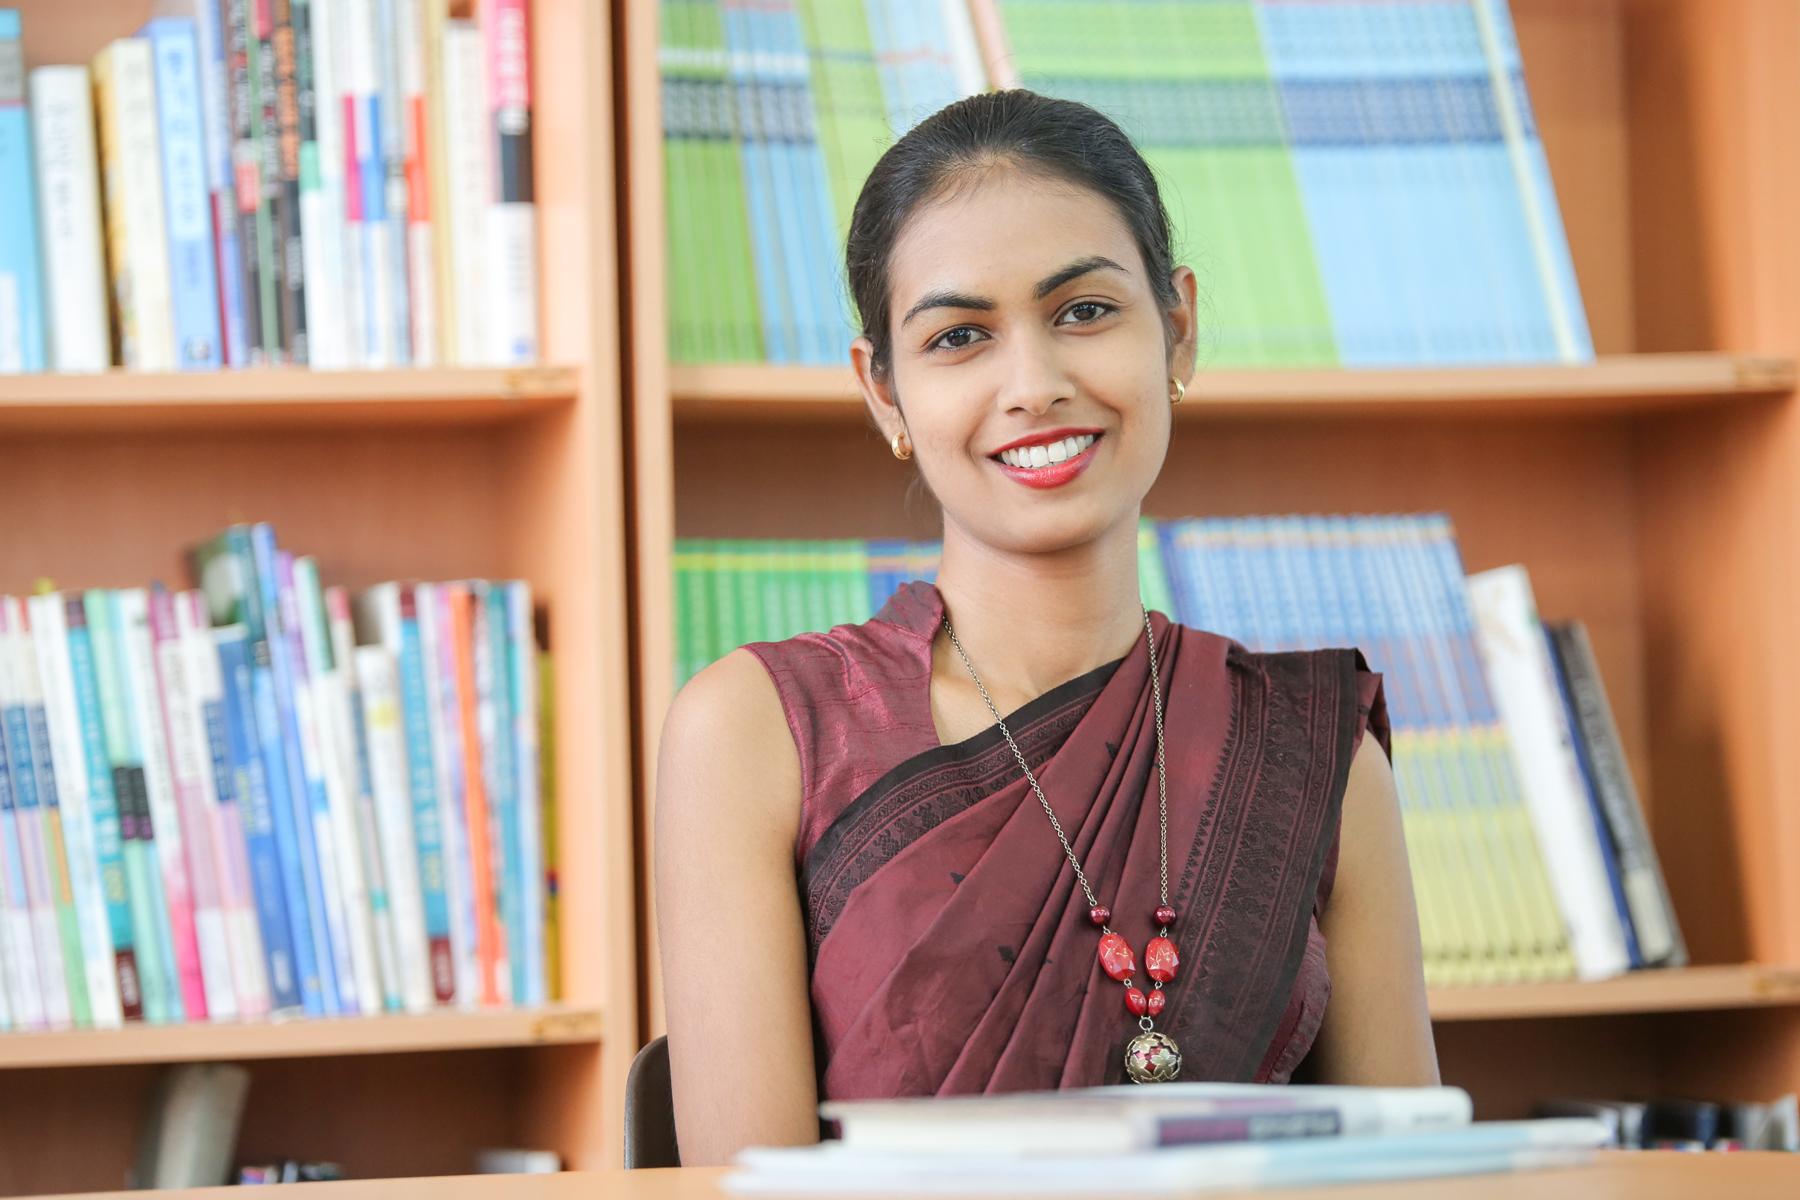 Ms. Imali Ruwanthika Edirisooriya